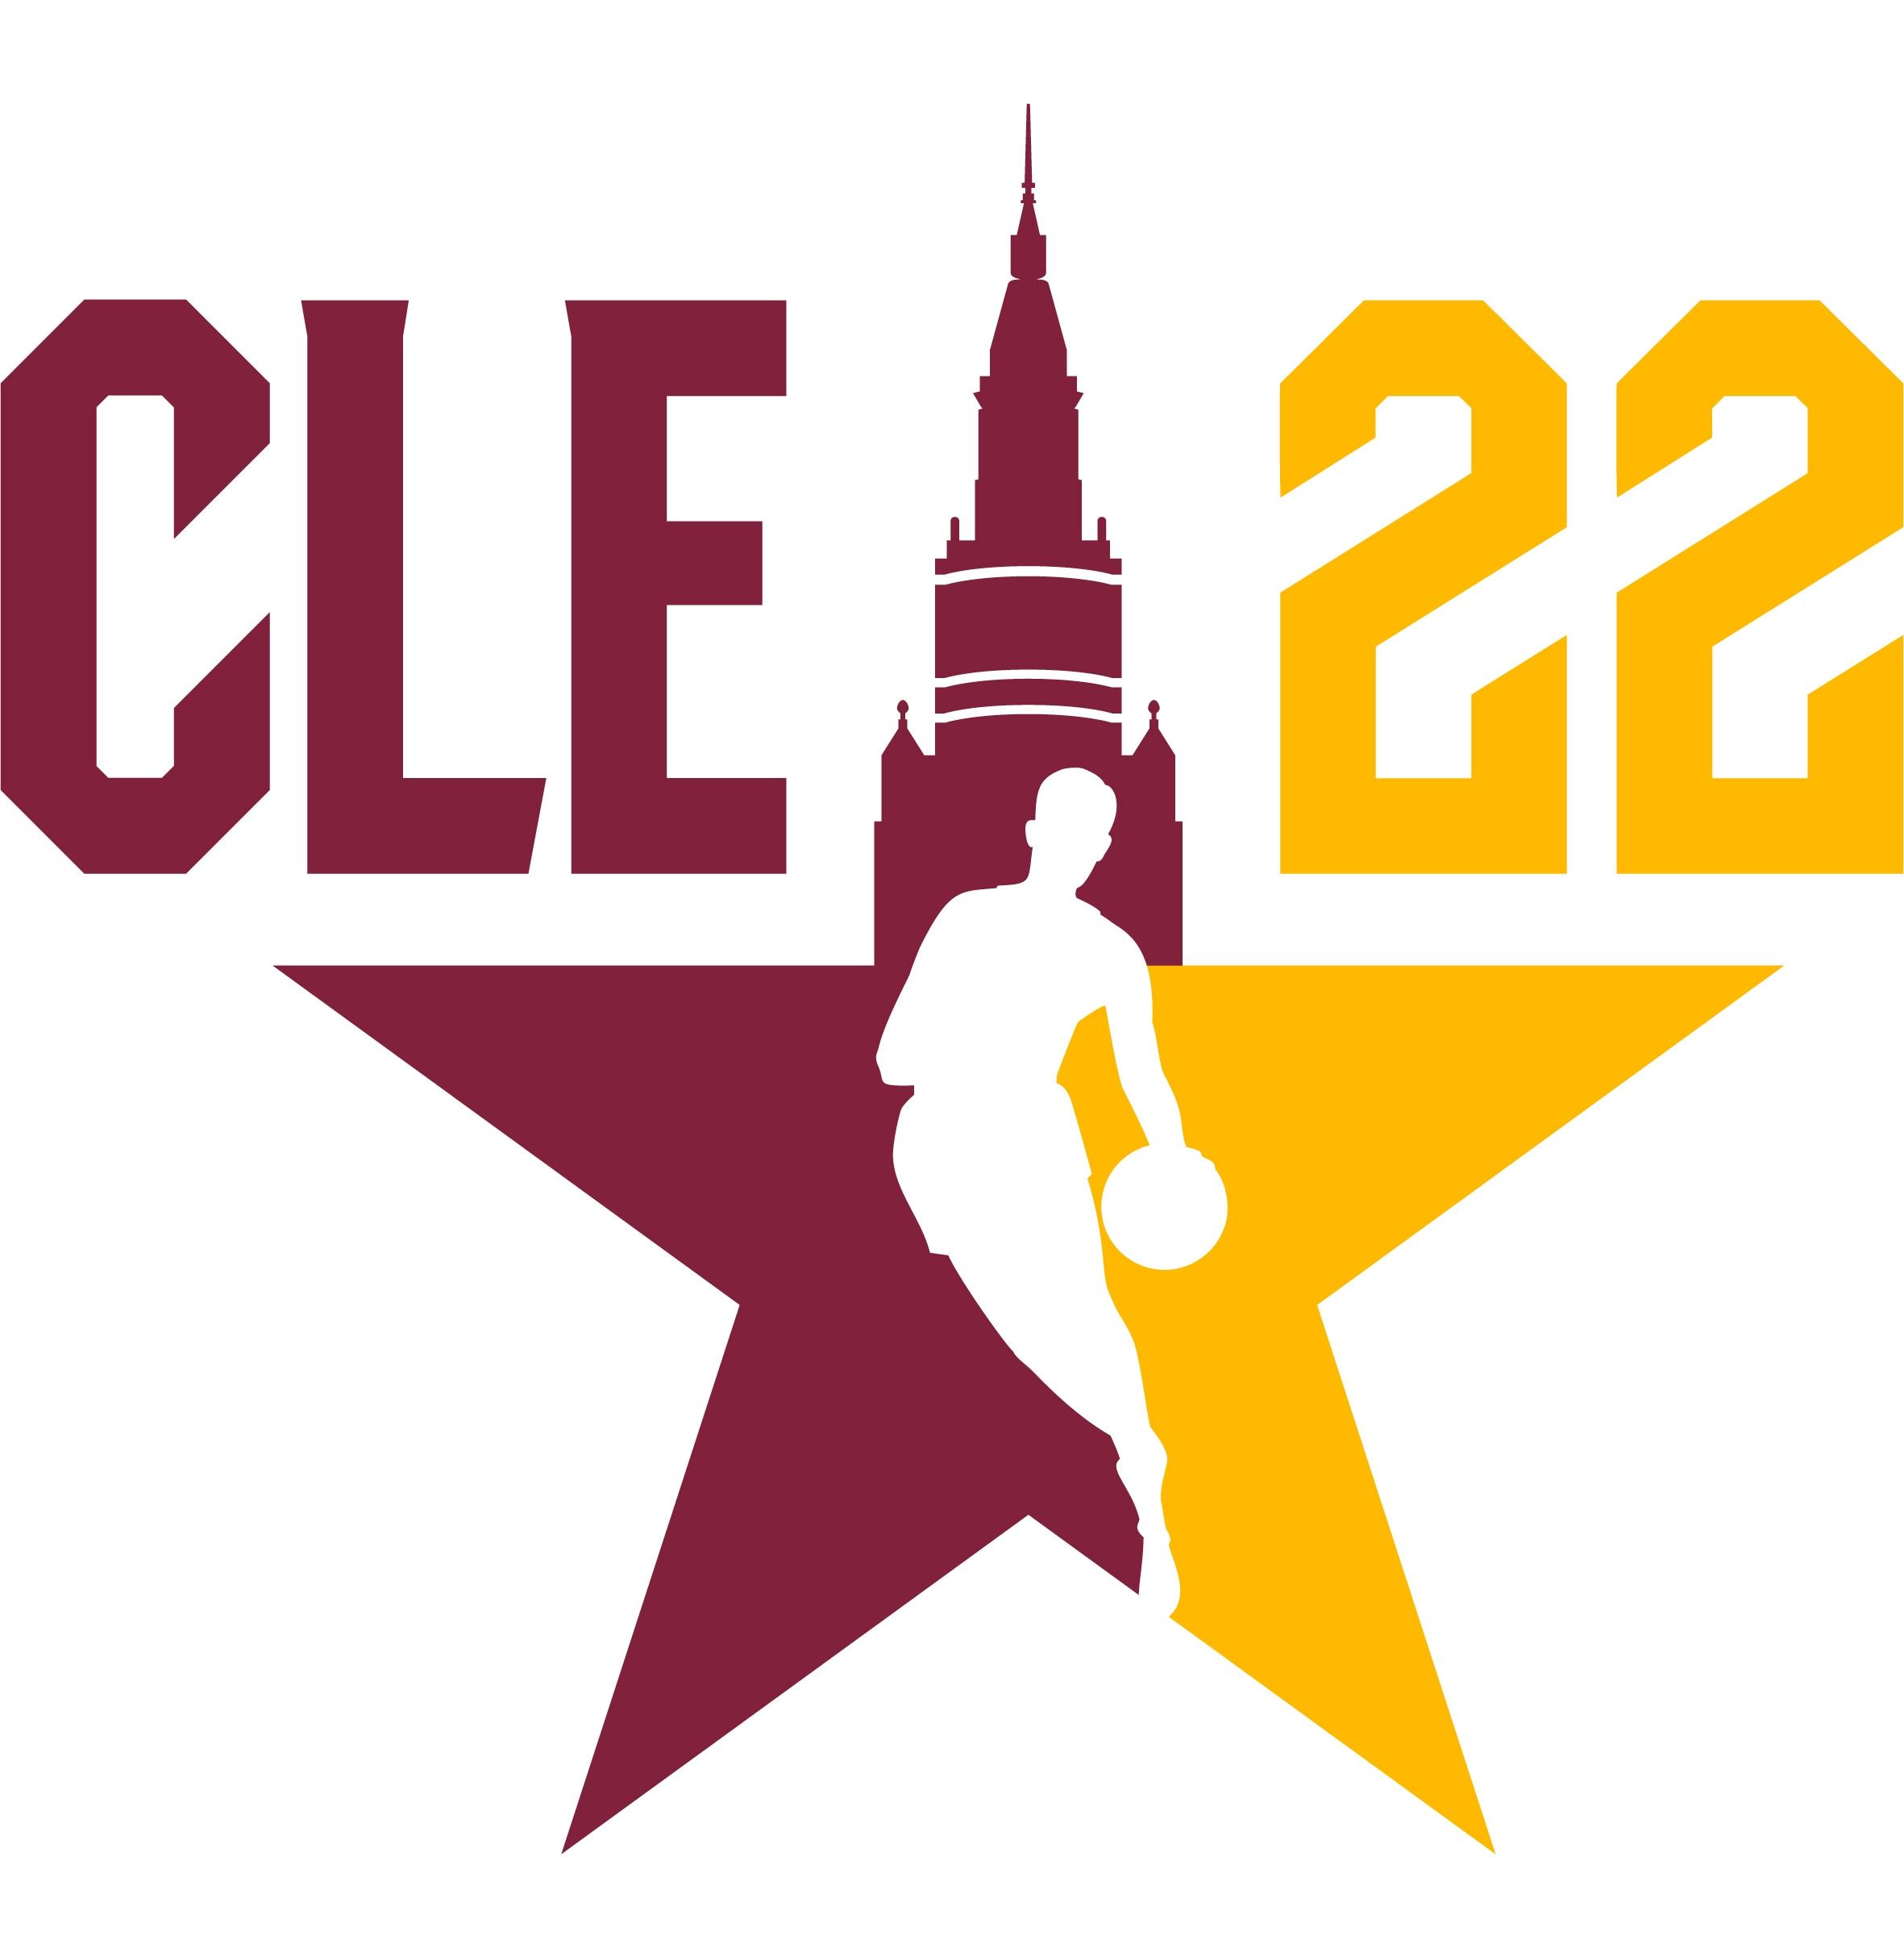 NBA unveils logos for NBA All-Star 2022